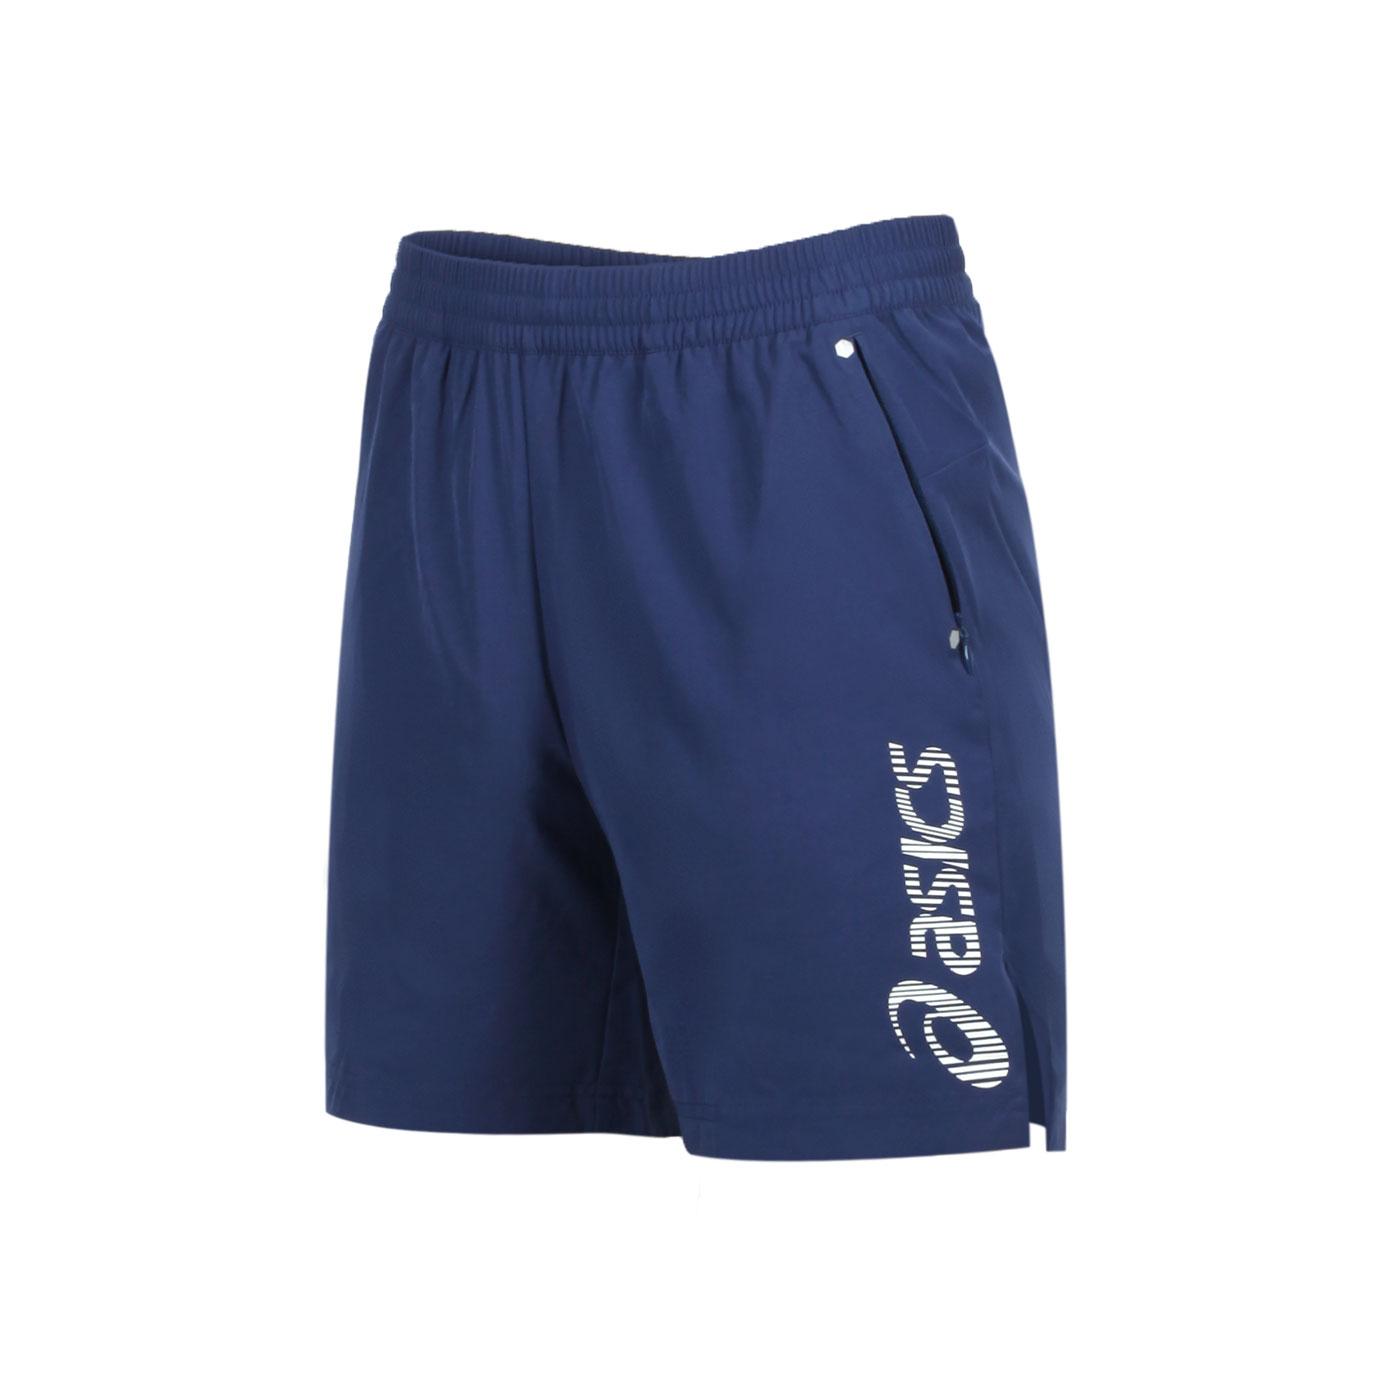 ASICS 男款7吋平織短褲 2011B492-001 - 丈青銀